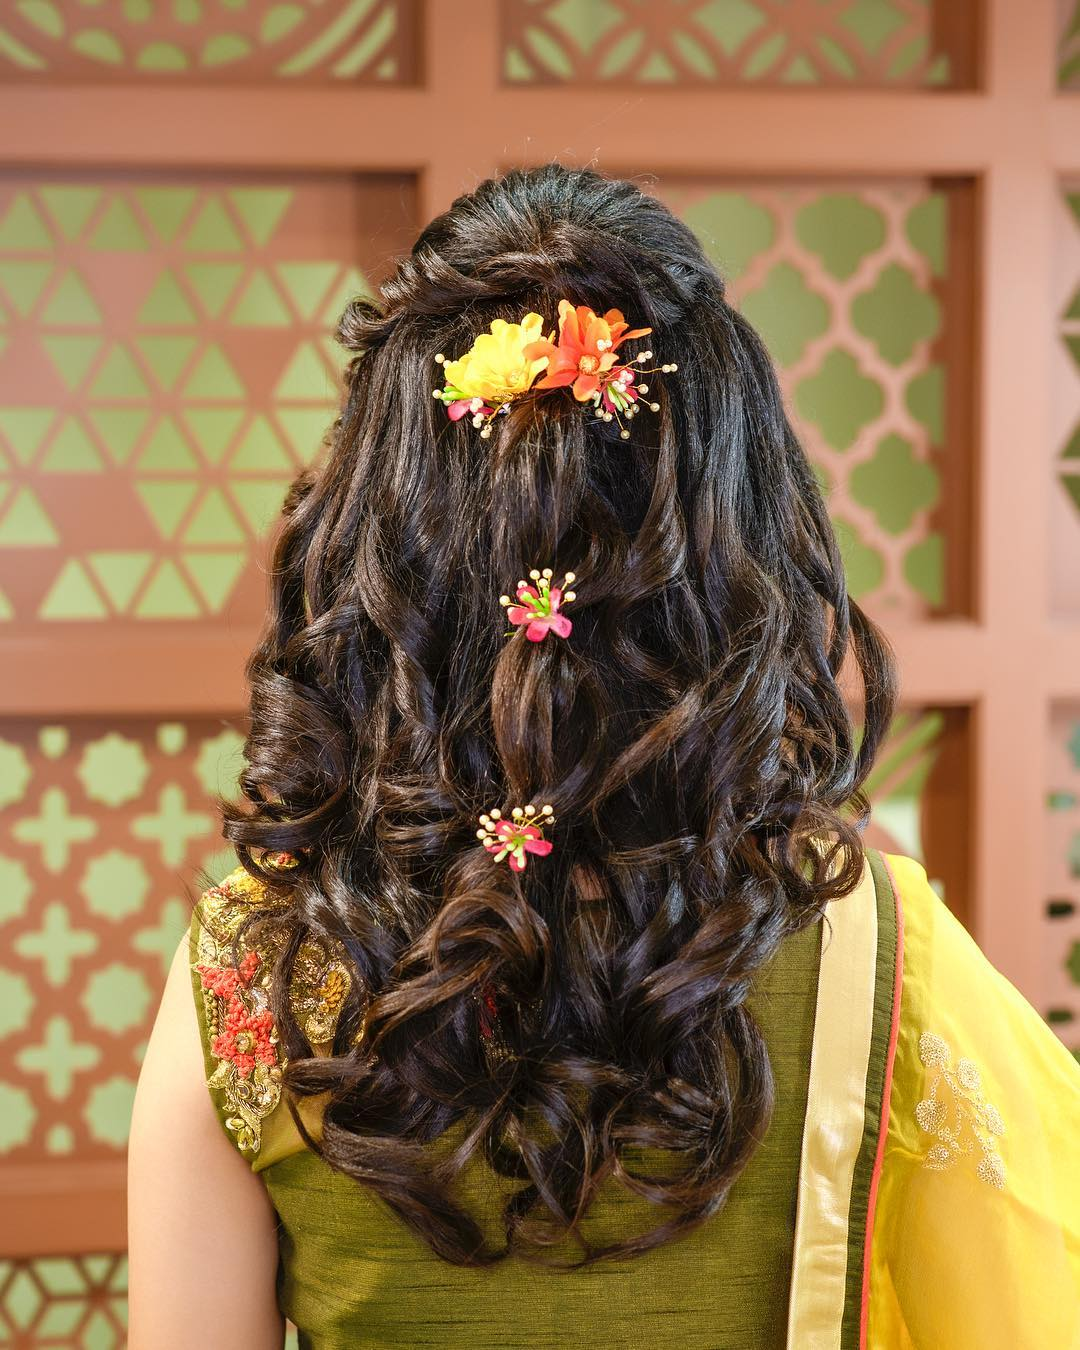 Yellow & Orange Floral hairstyles for Haldi Floral hairstyles for Haldi and Mehendi Ceremonies!a